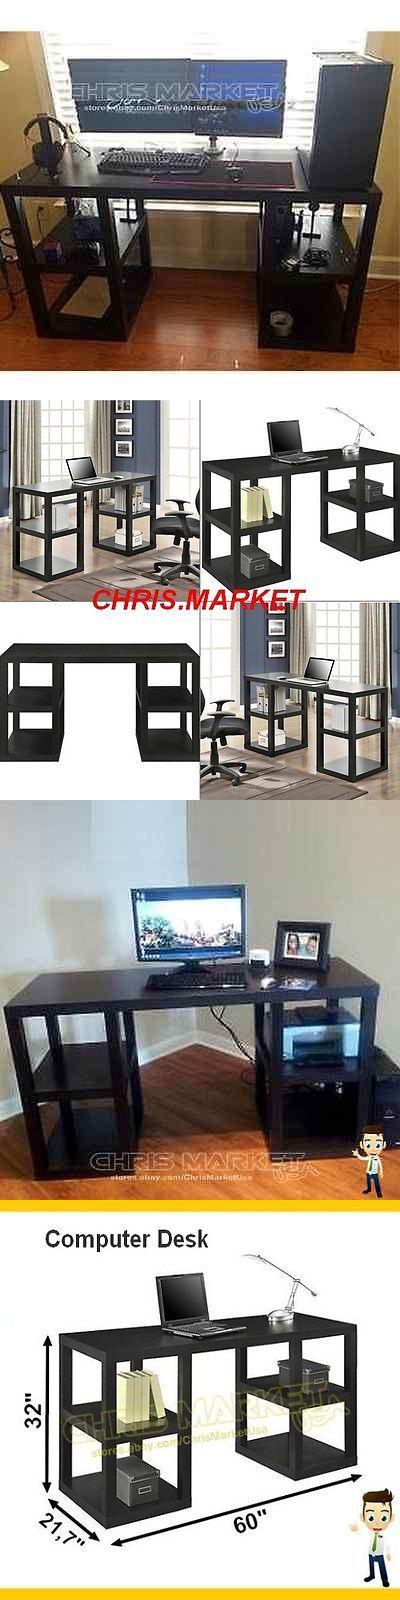 Office Furniture: Computer Desk Home Office Double Pedestal Parsons Desk Furniture Modern Black BUY IT NOW ONLY: $106.68